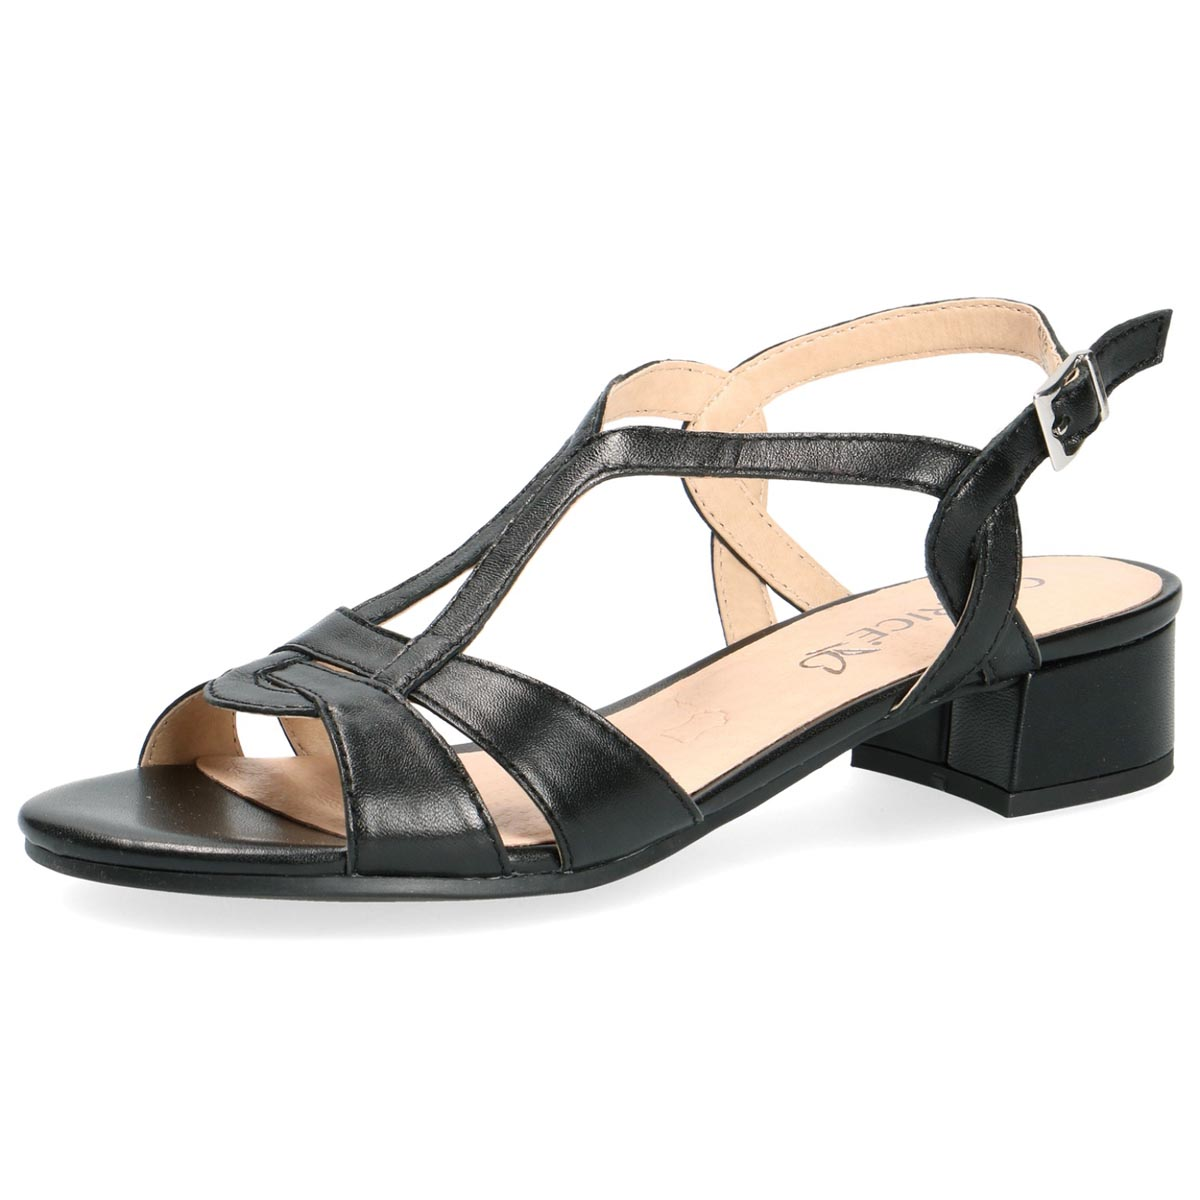 Zelda Nero - Caprice Black Summer Sandal